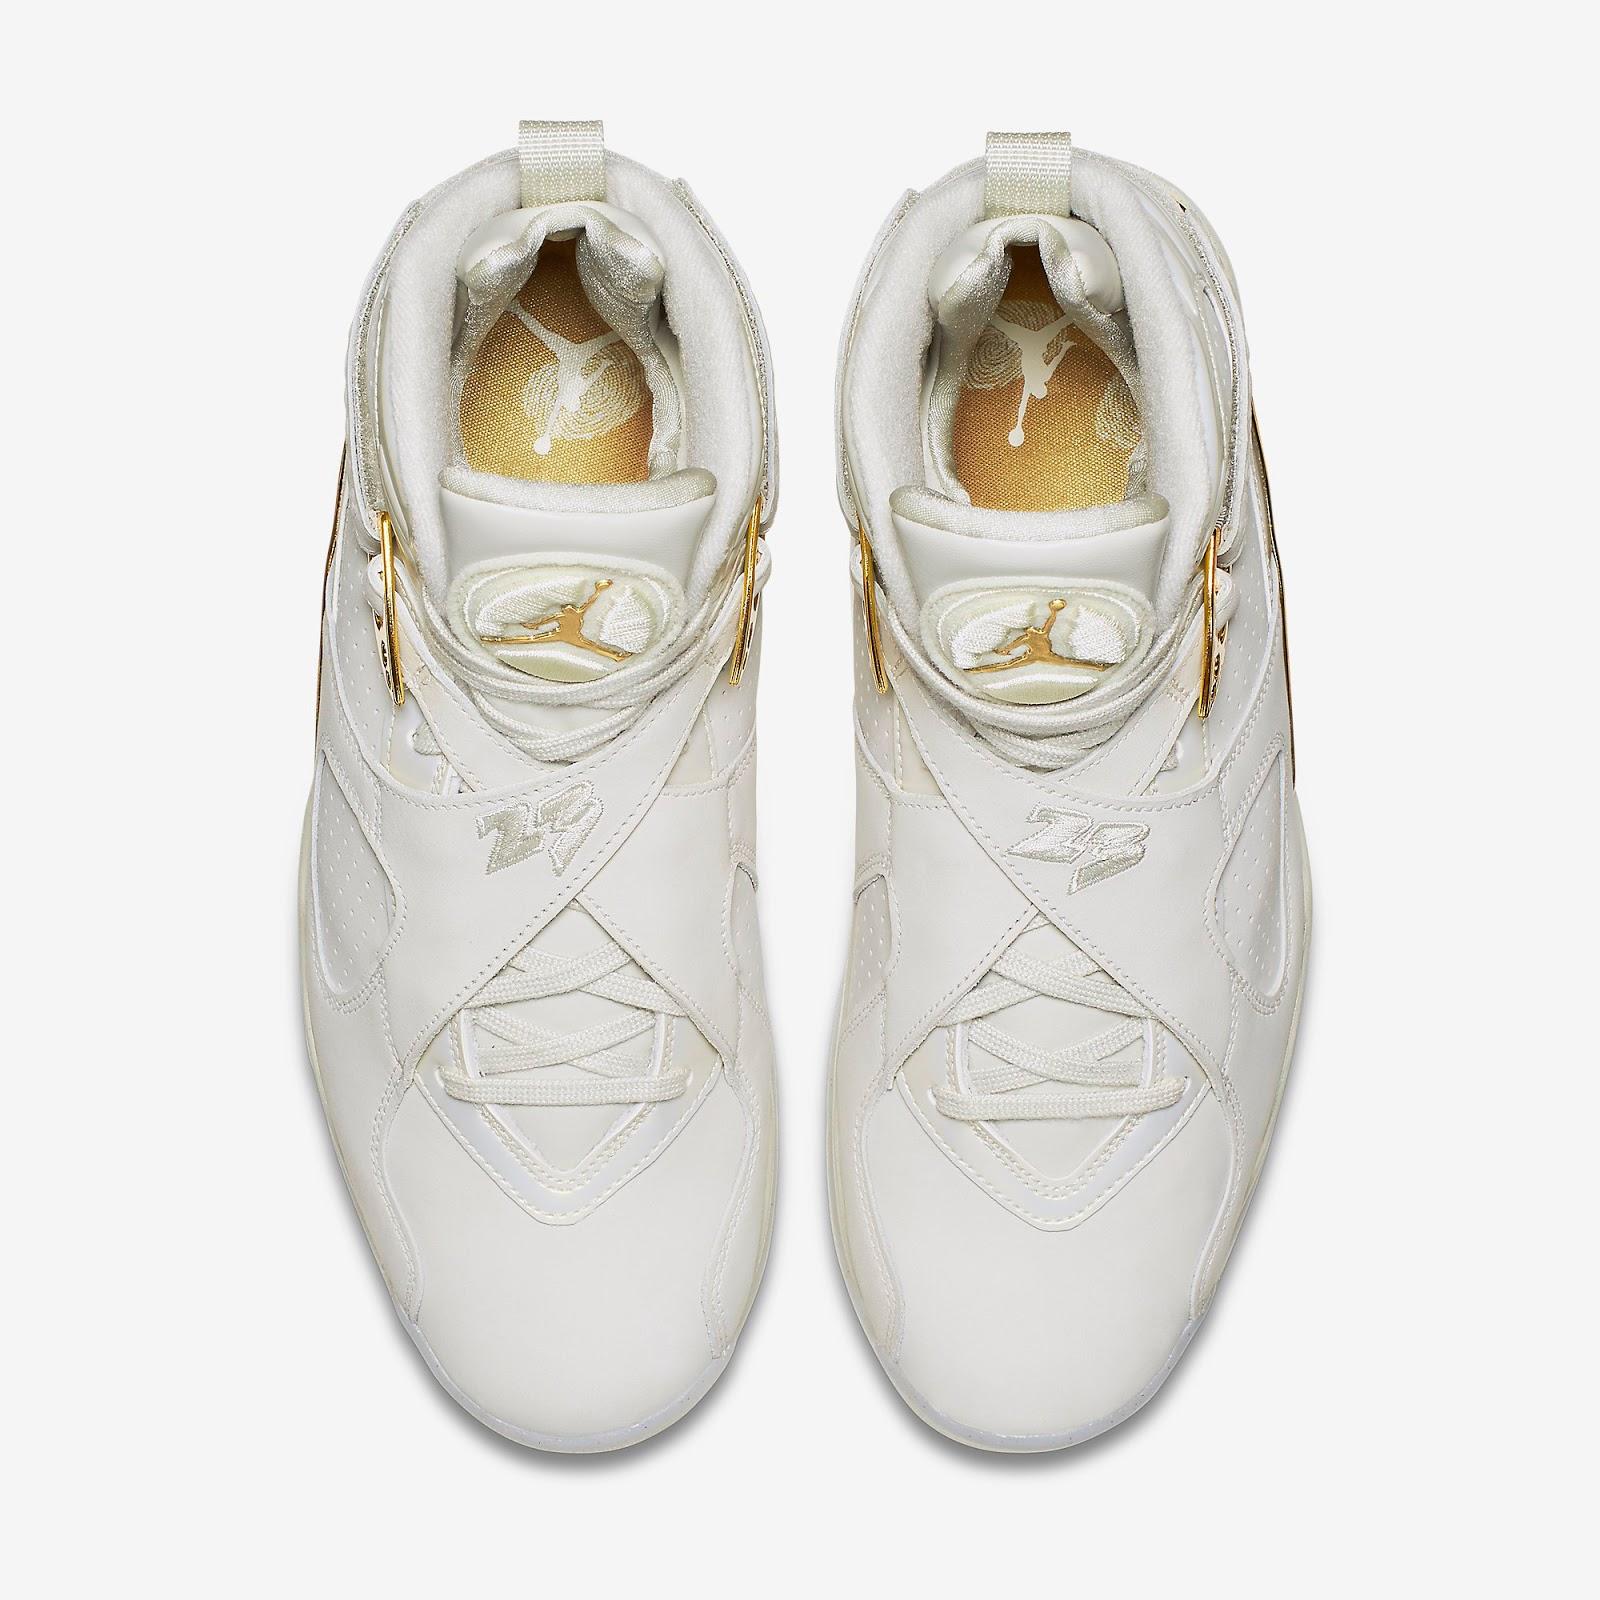 9f6a1d95f1f6 ajordanxi Your  1 Source For Sneaker Release Dates  Air Jordan 8 Retro C C